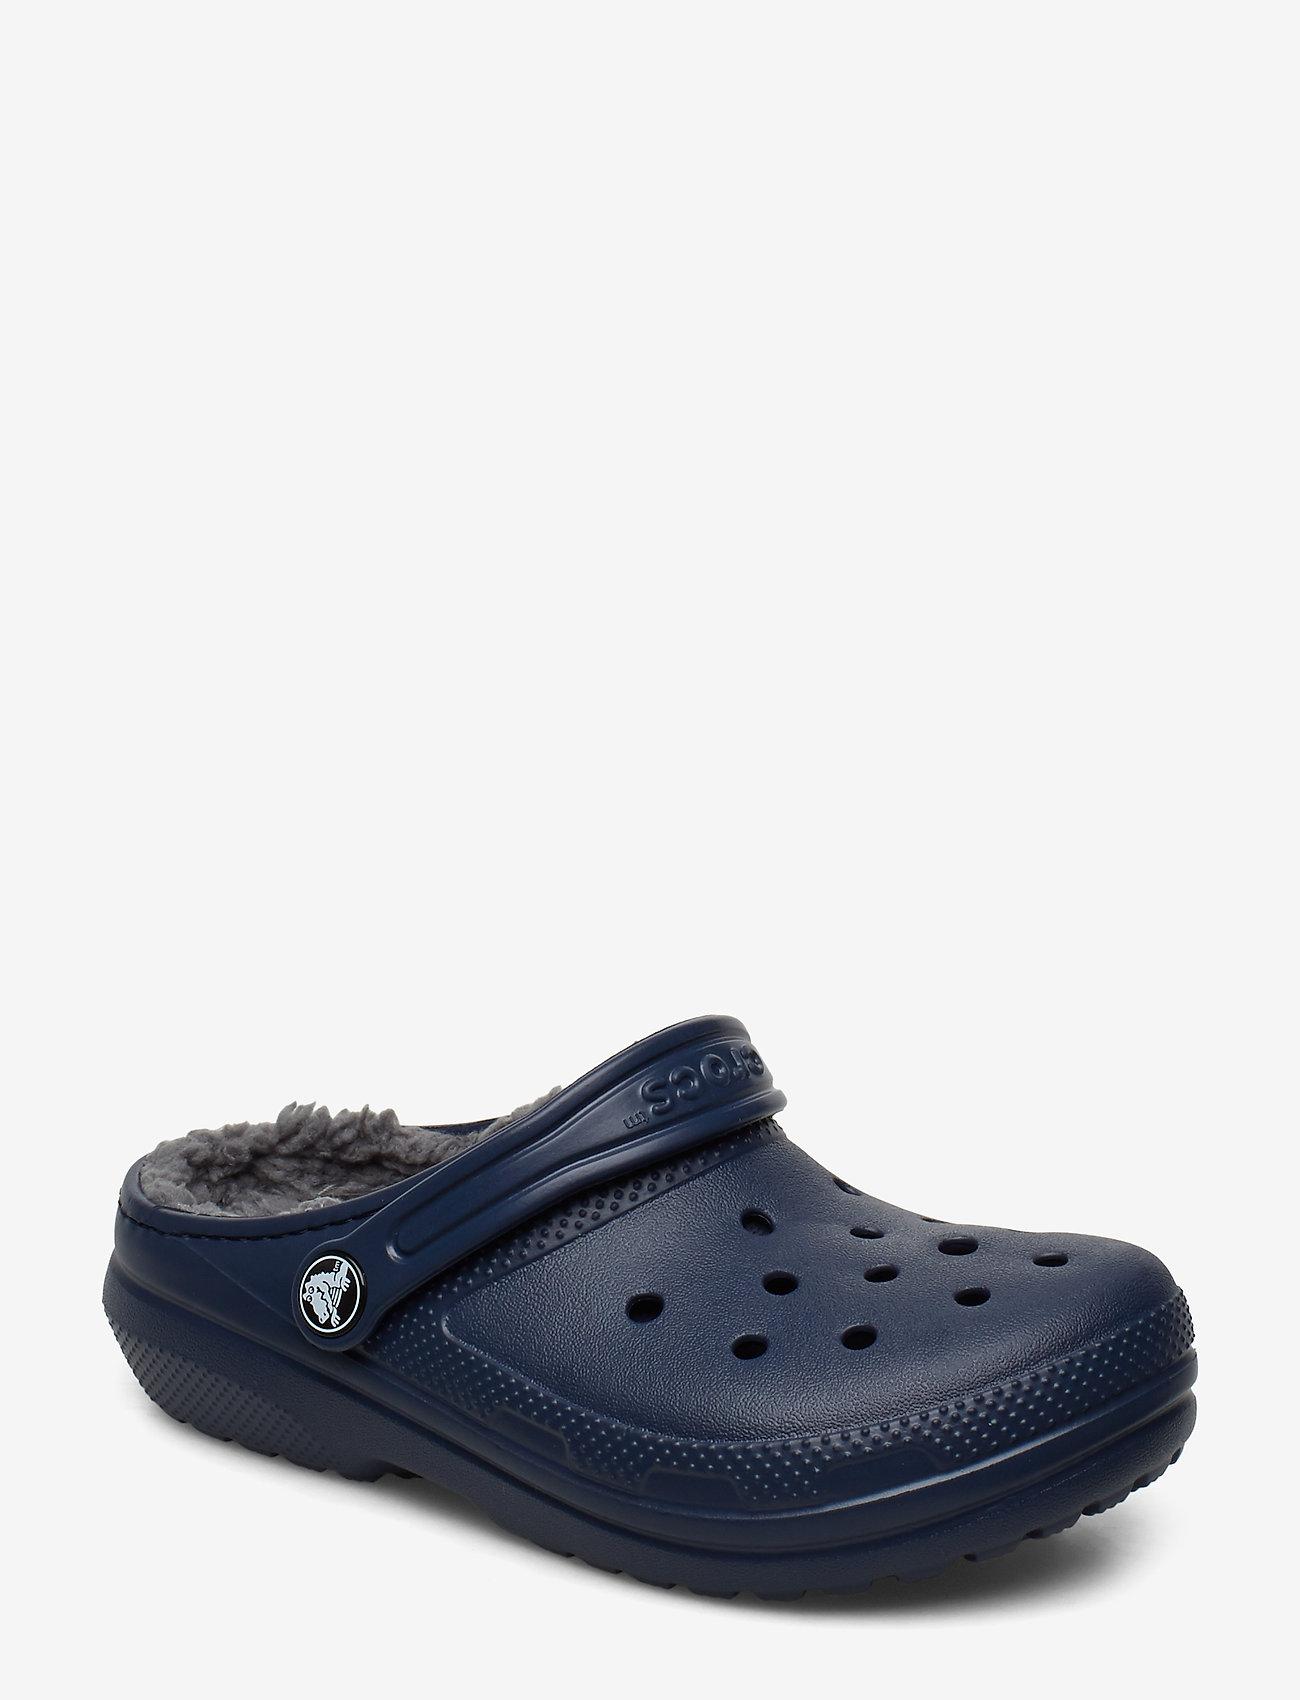 Crocs - Classic Lined Clog K - navy/charcoal - 0